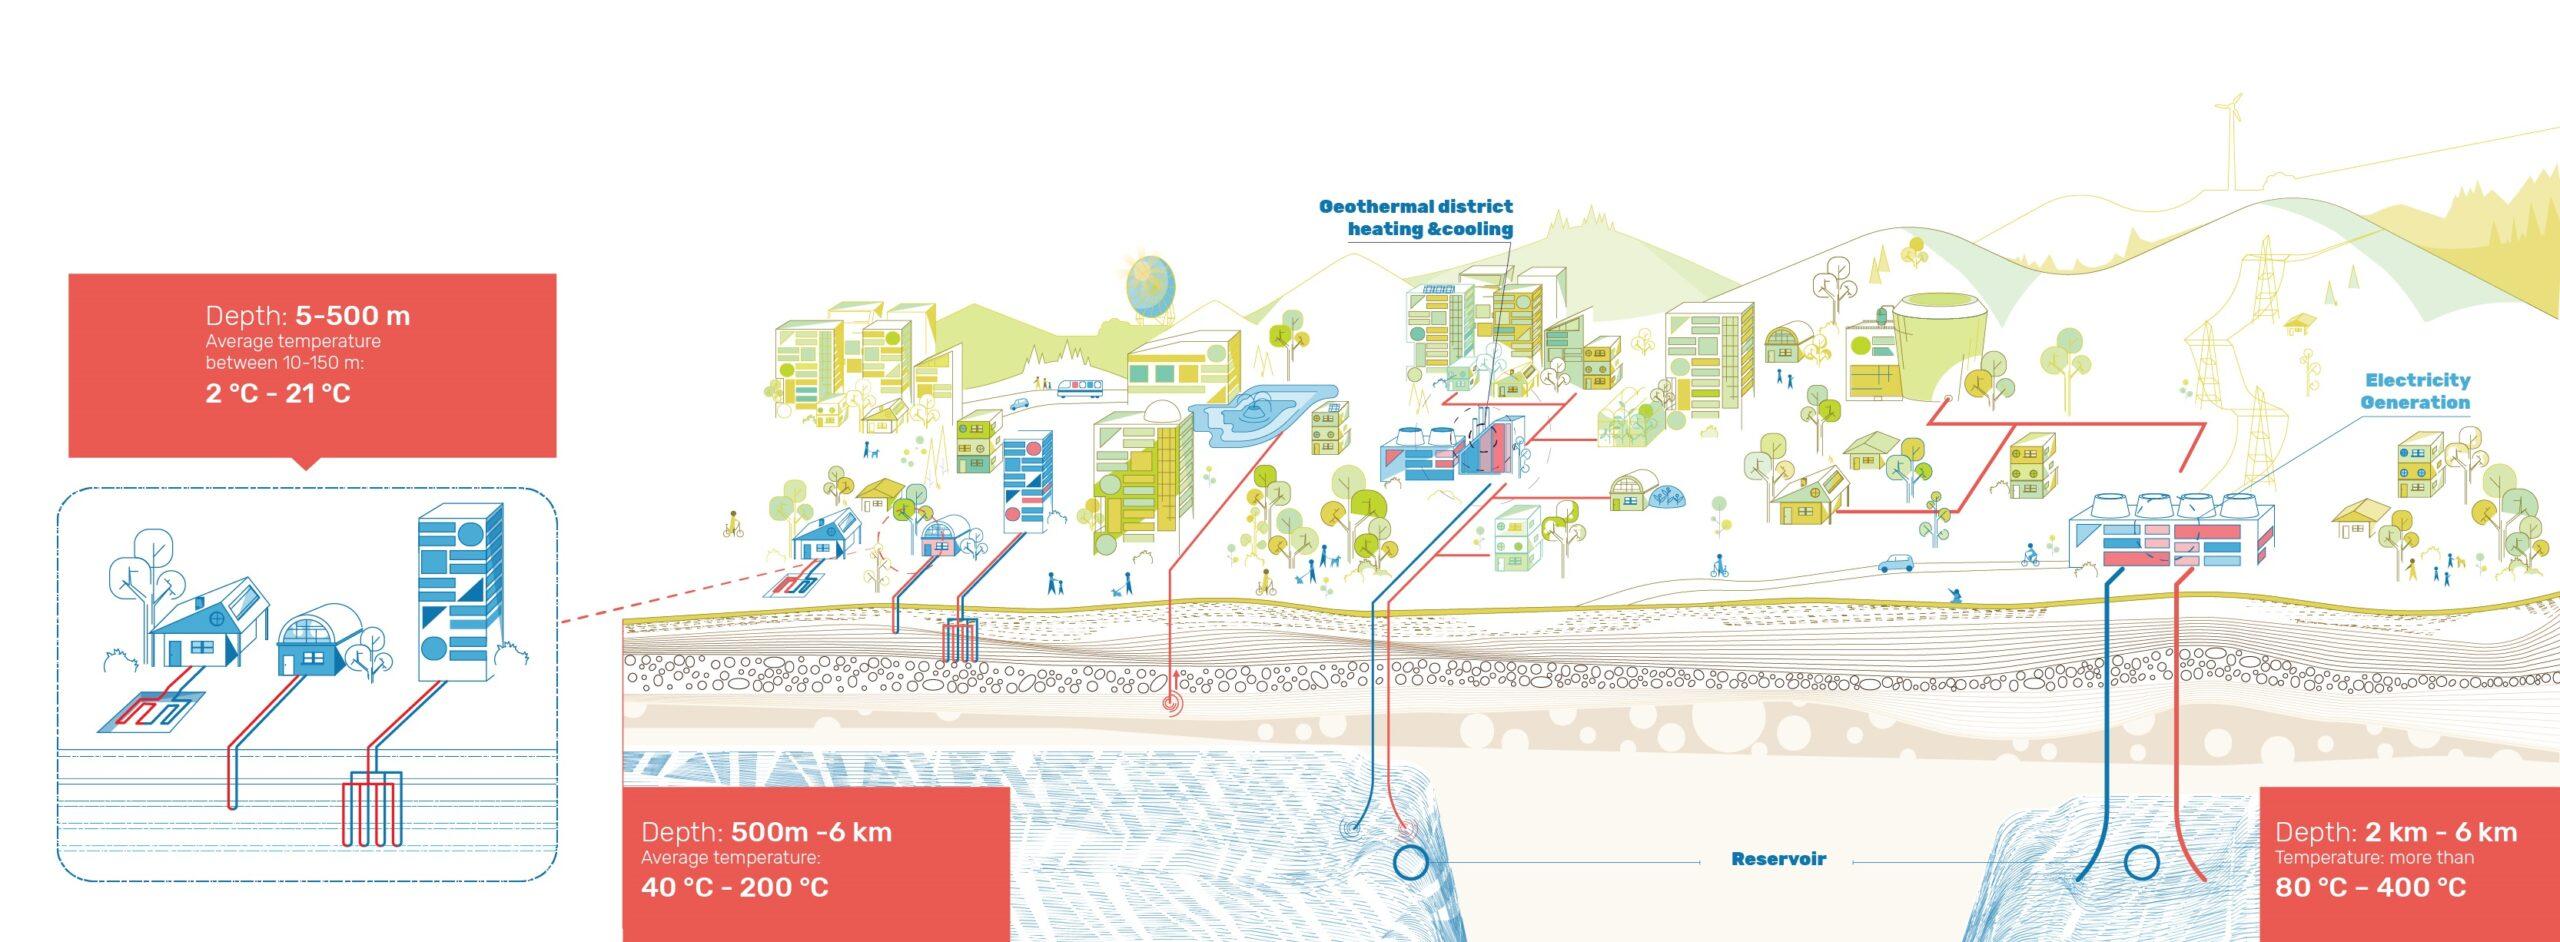 EGEC's brochure – Geothermal energy: the bedrock of energy transition